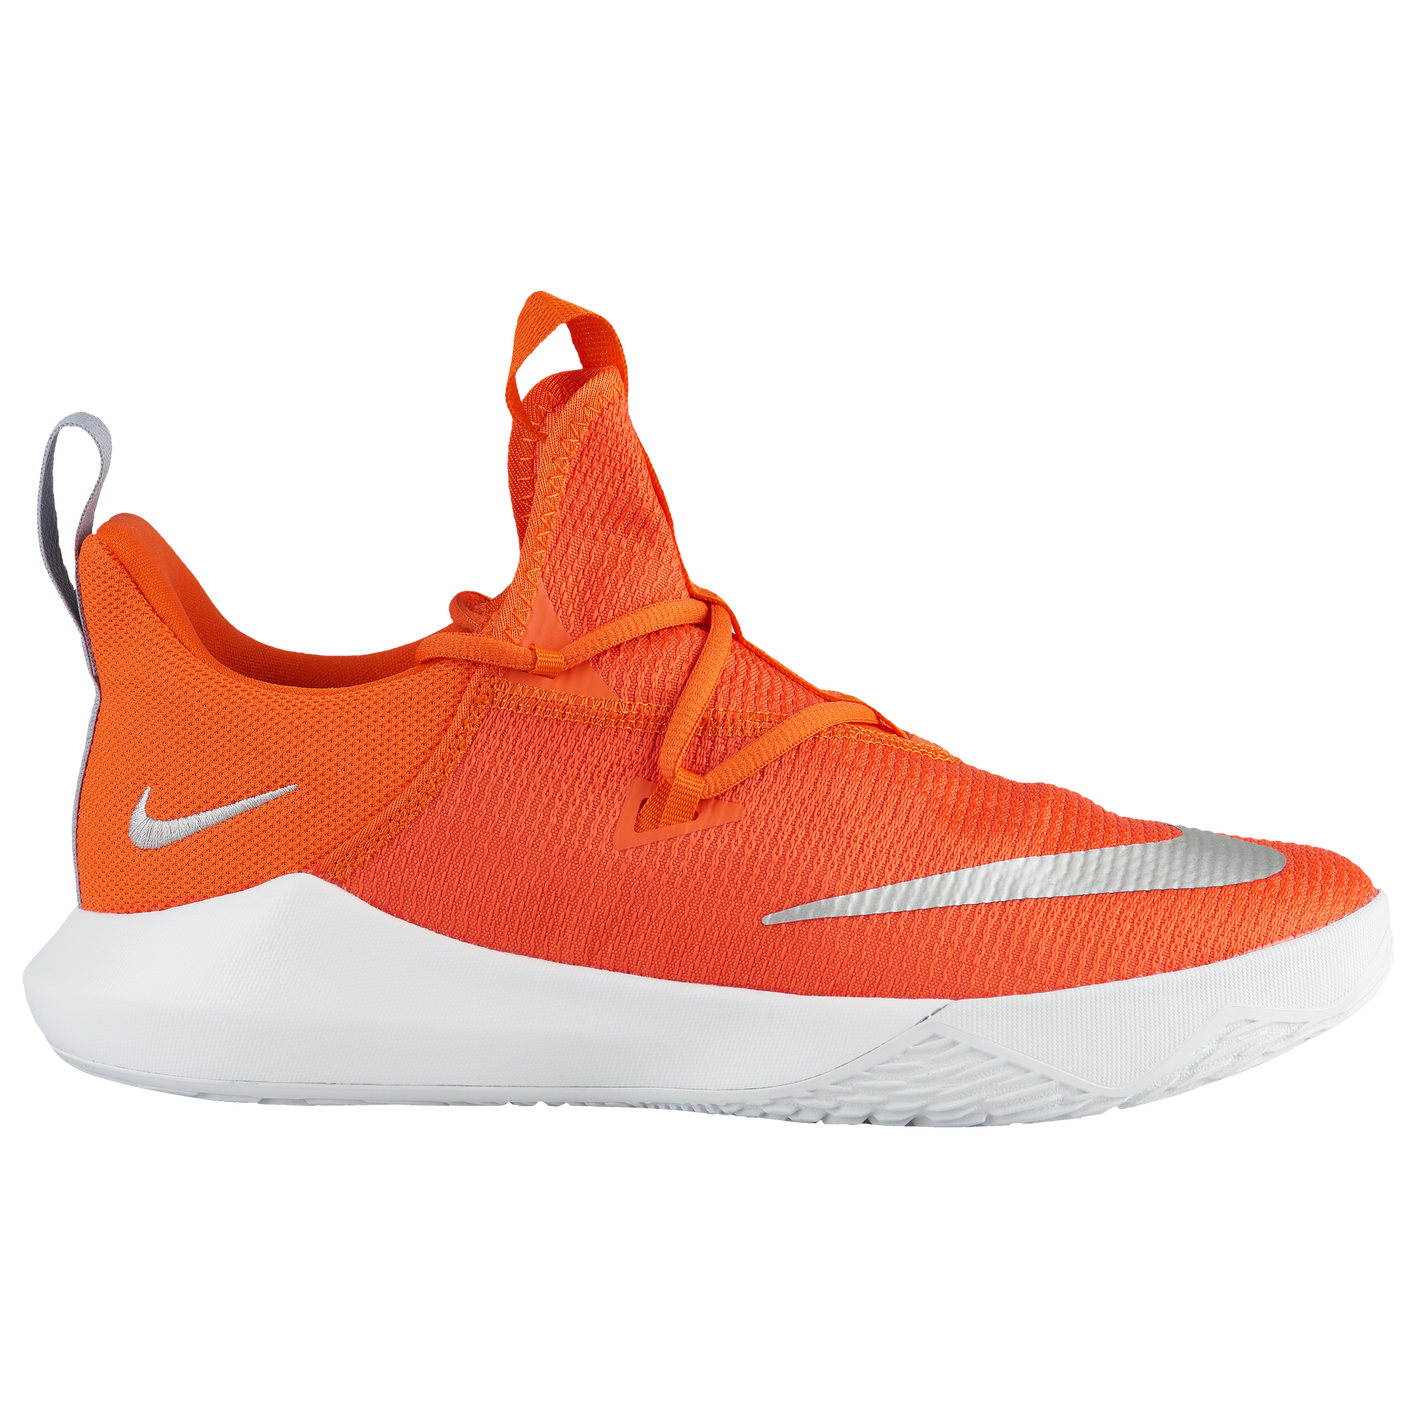 357677b50e20 Nike Zoom Shift 2 - Men s - Basketball - Shoes - Brilliant Orange ...